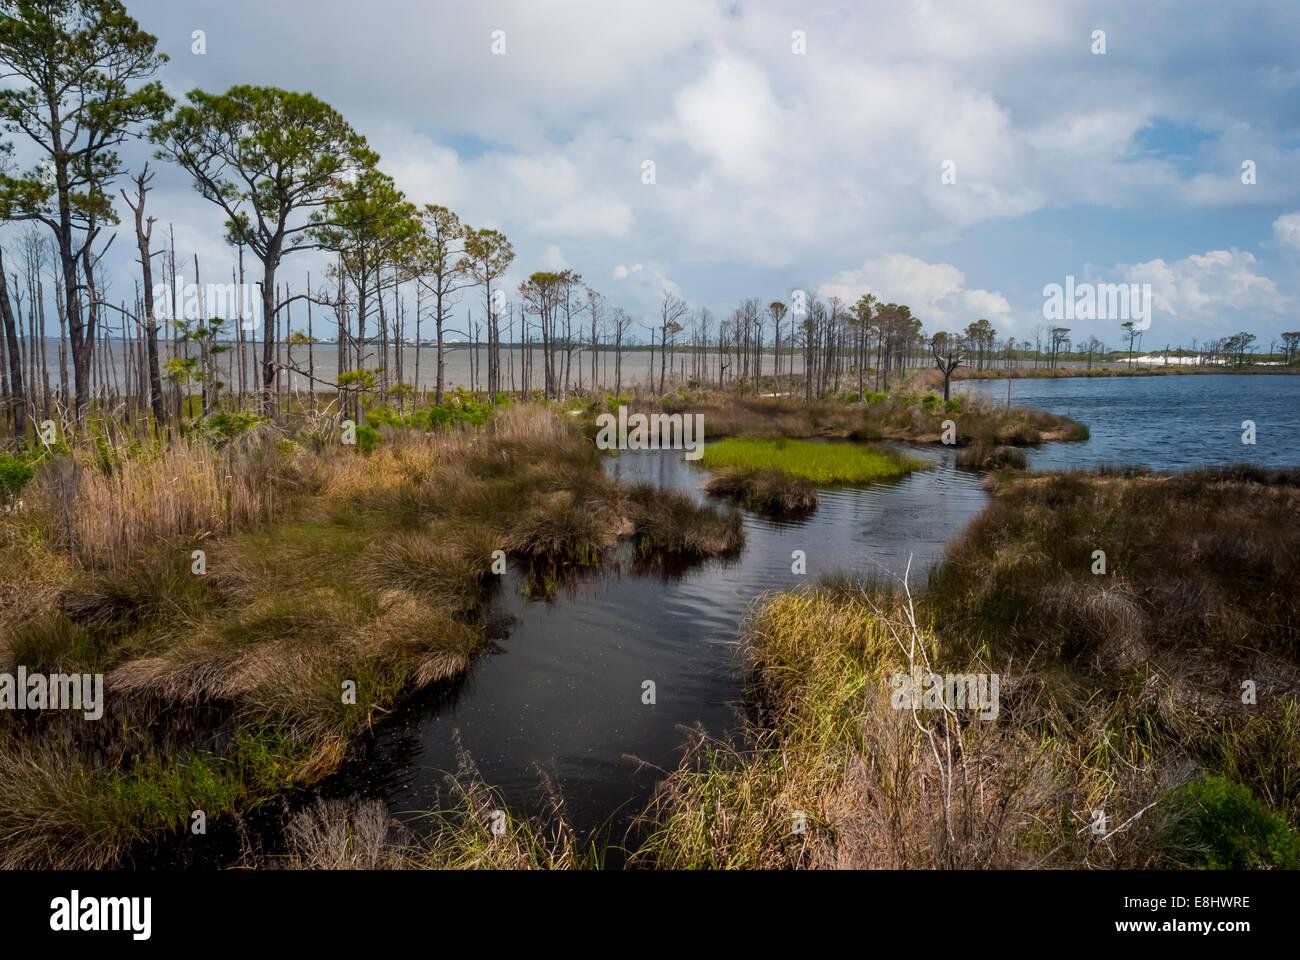 Gator Lake with Little Lagoon in the left background in Bon Secour National Wildlife Refuge, Alabama gulf coast, - Stock Image